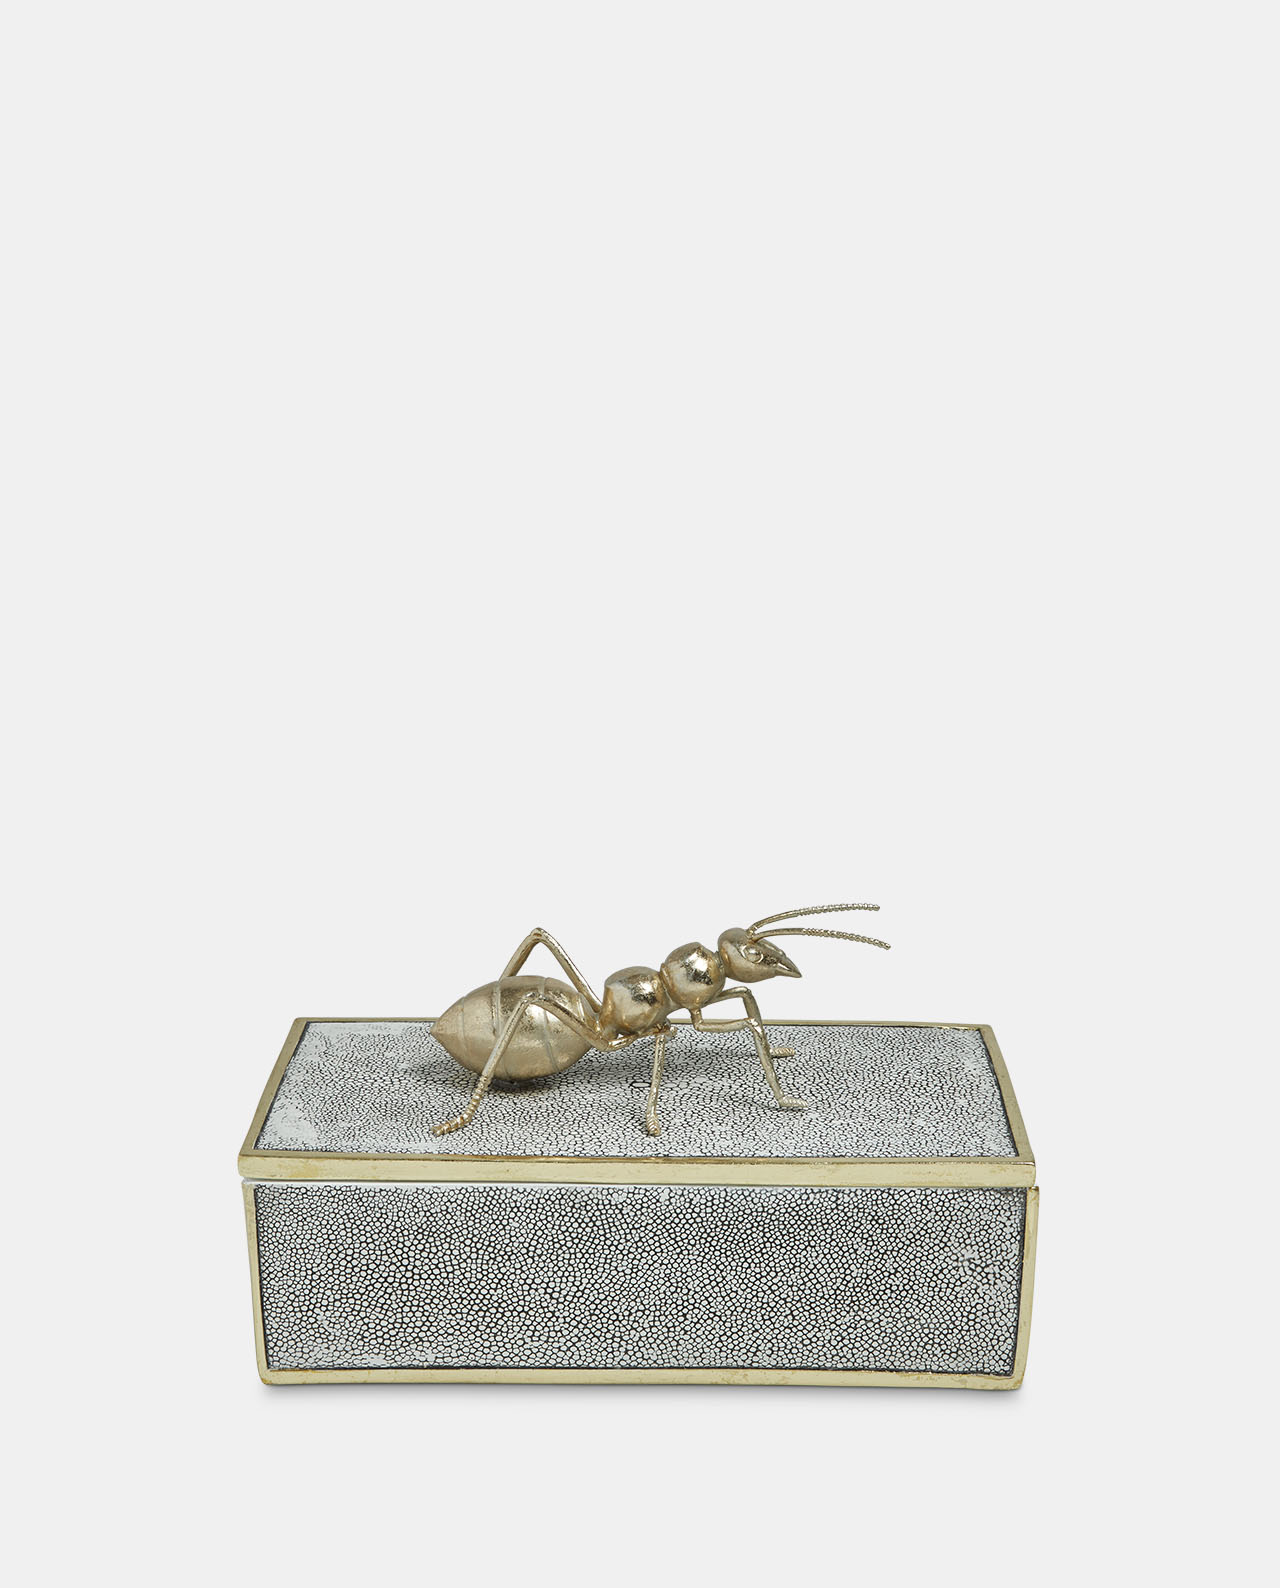 Decorative Ant Box